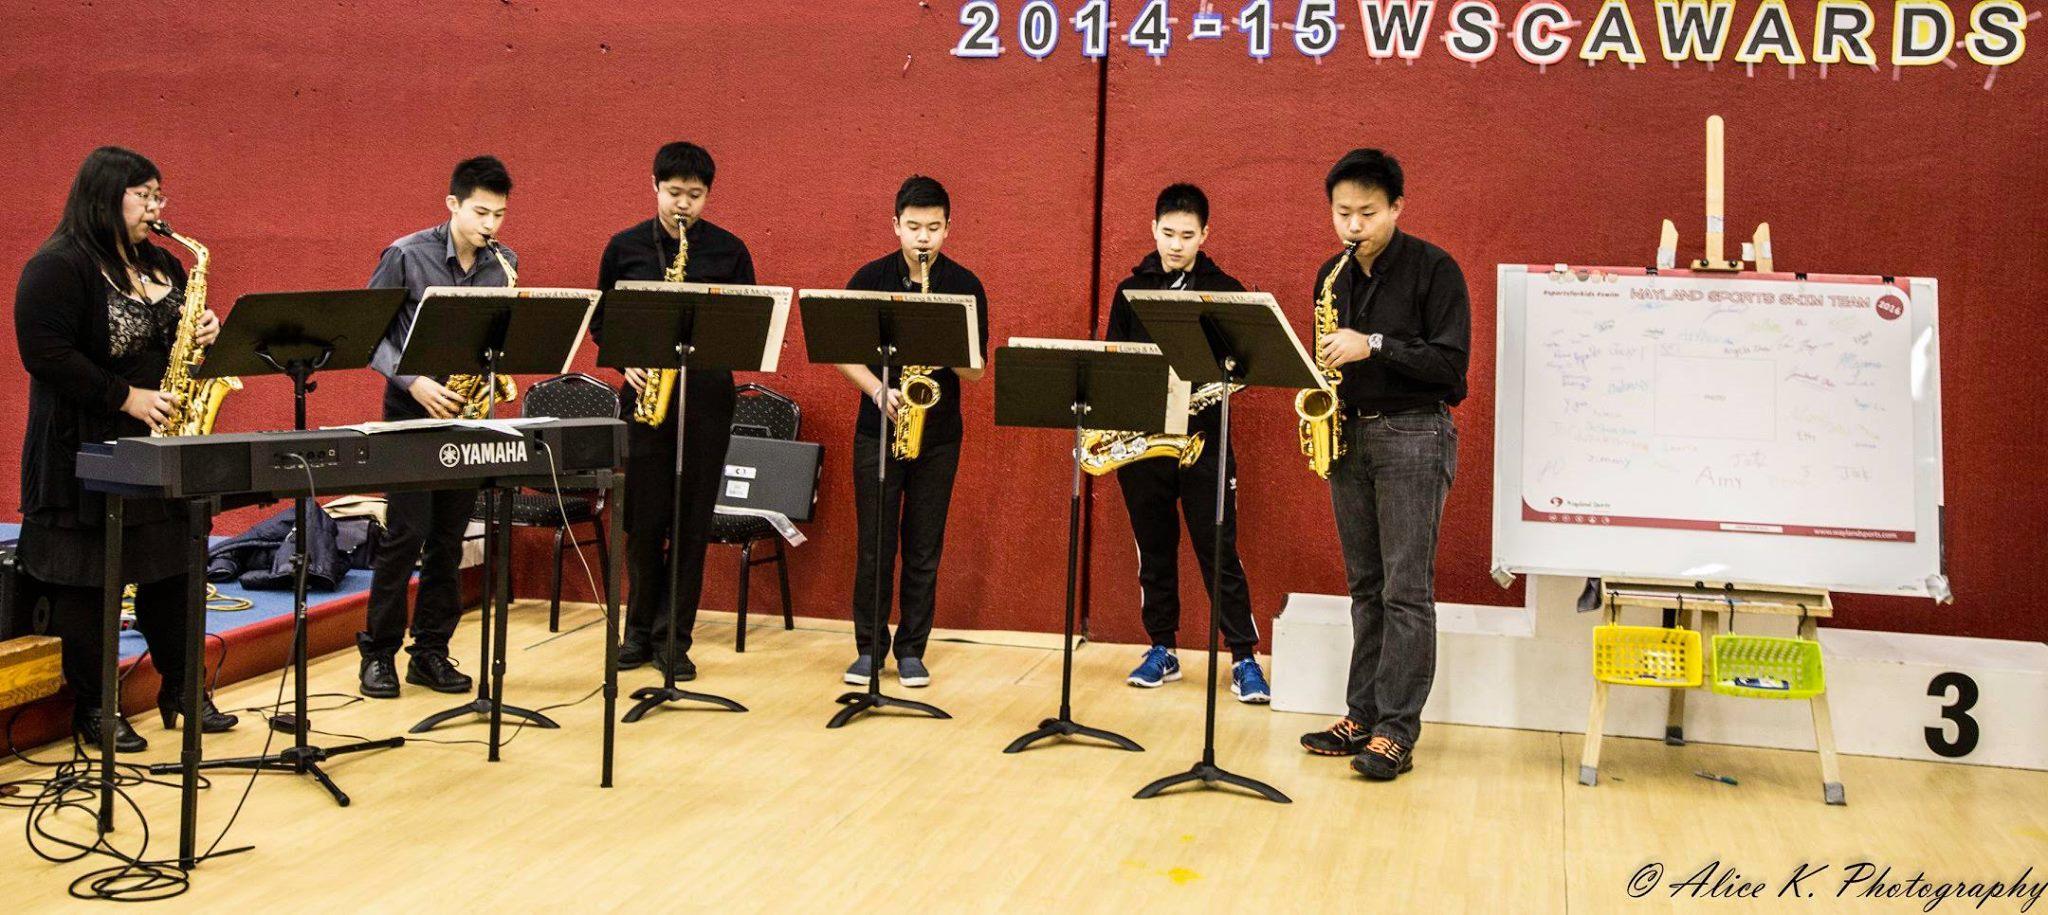 Event performance